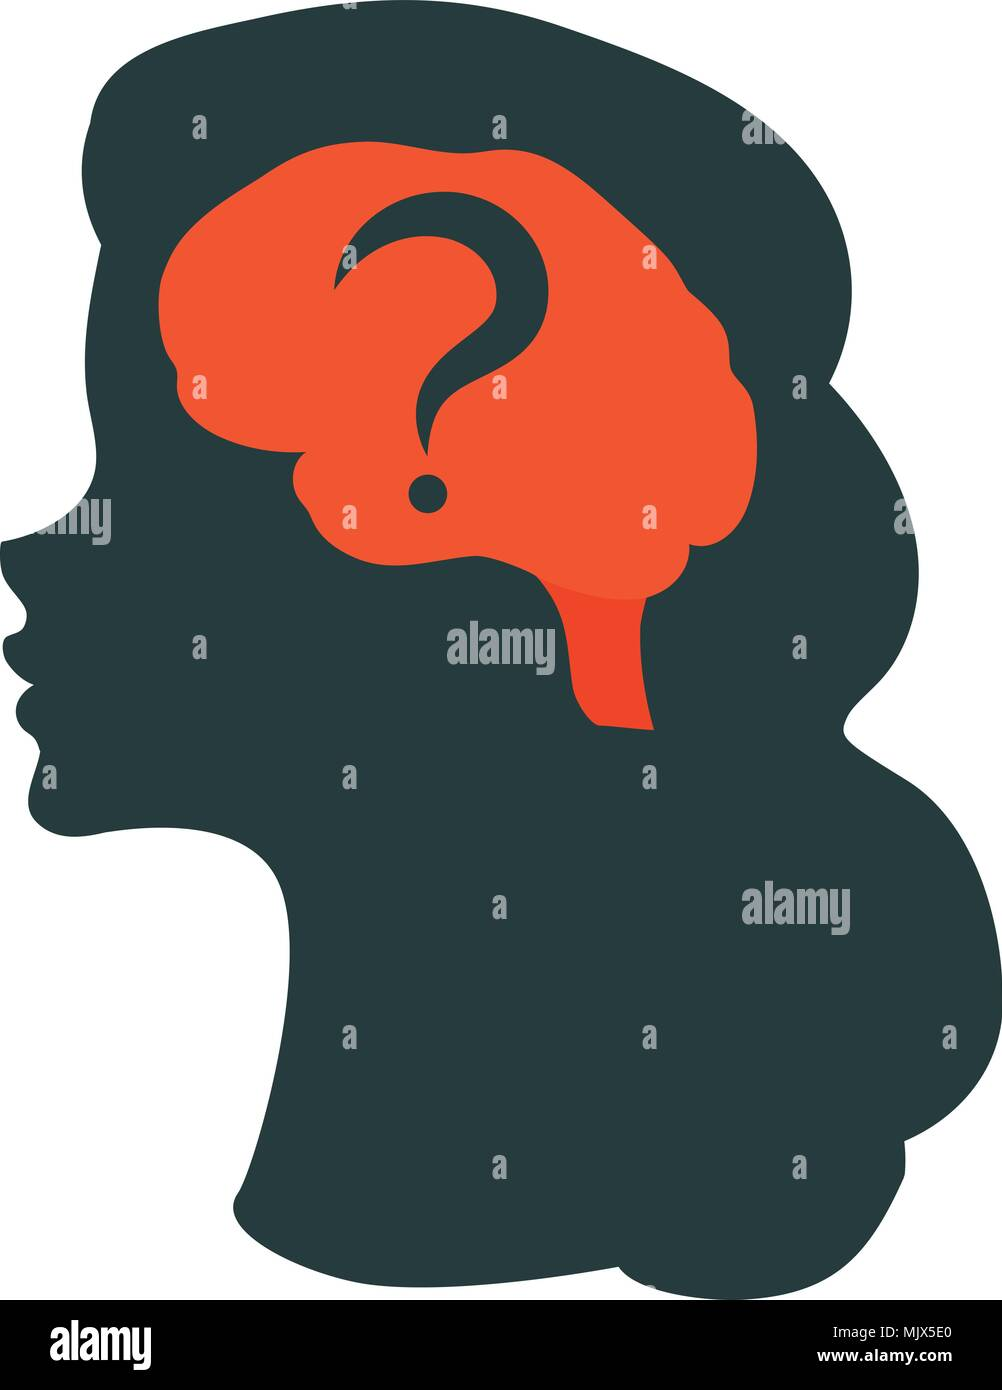 Human brain illustration - Stock Image